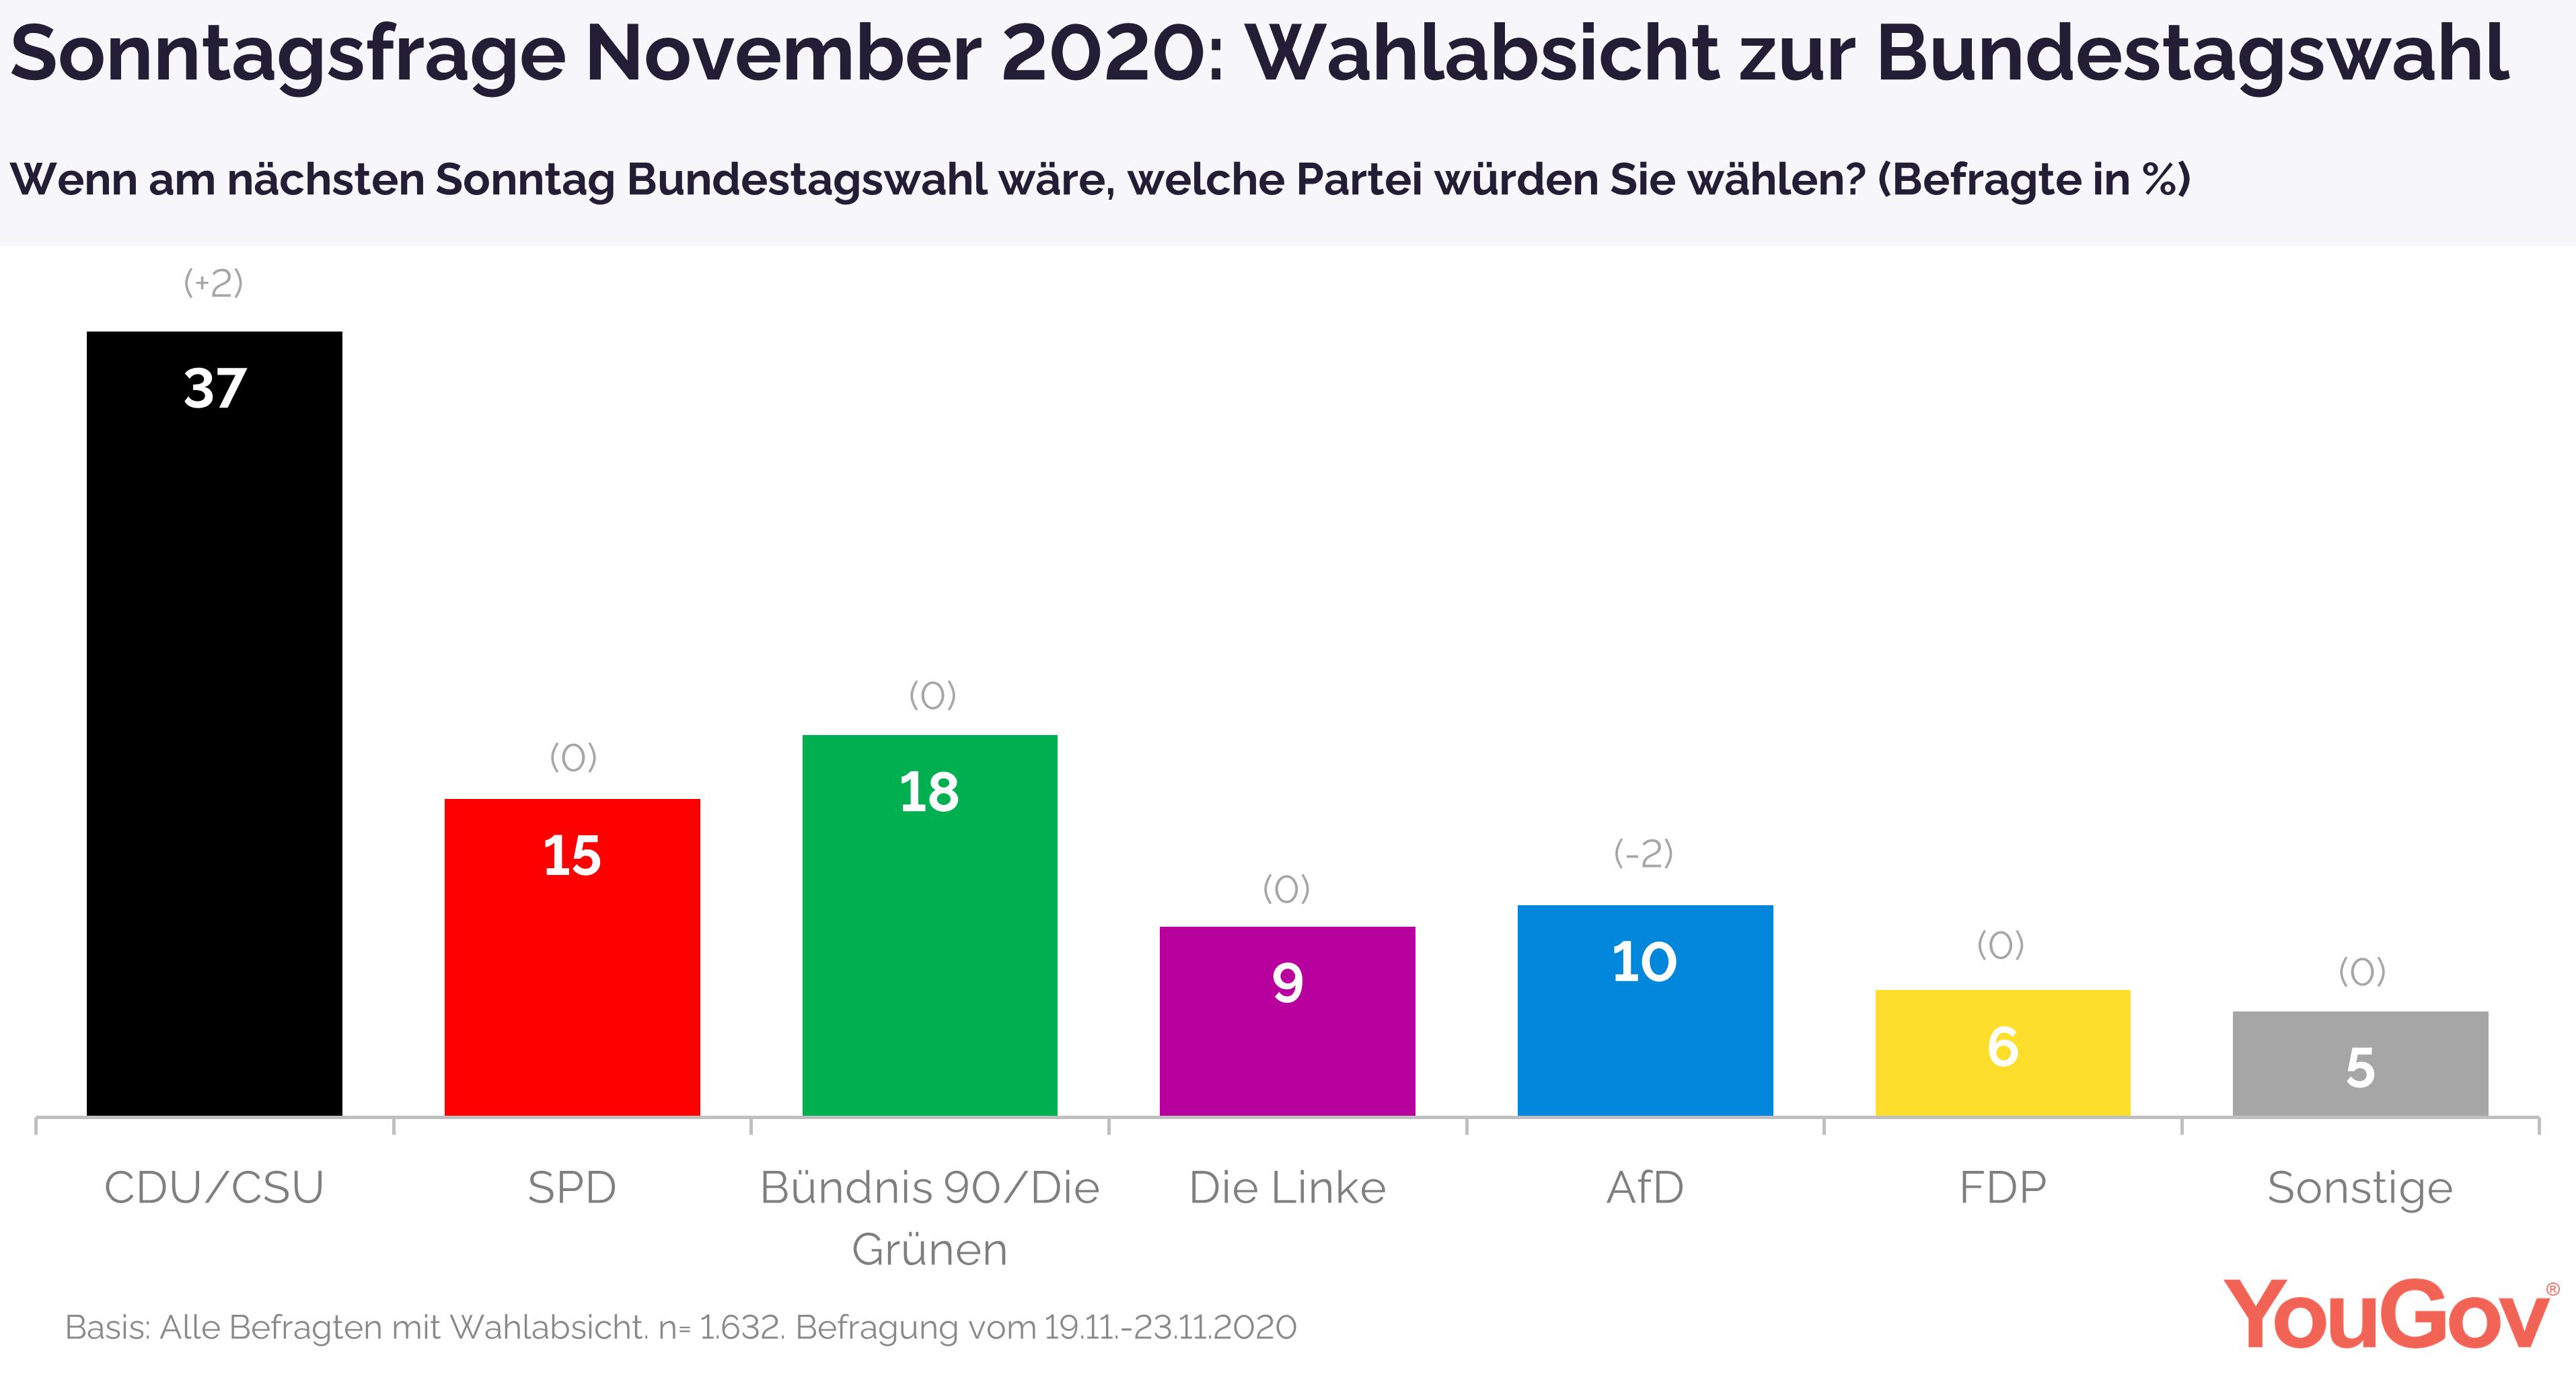 Wahlabsicht November 2020